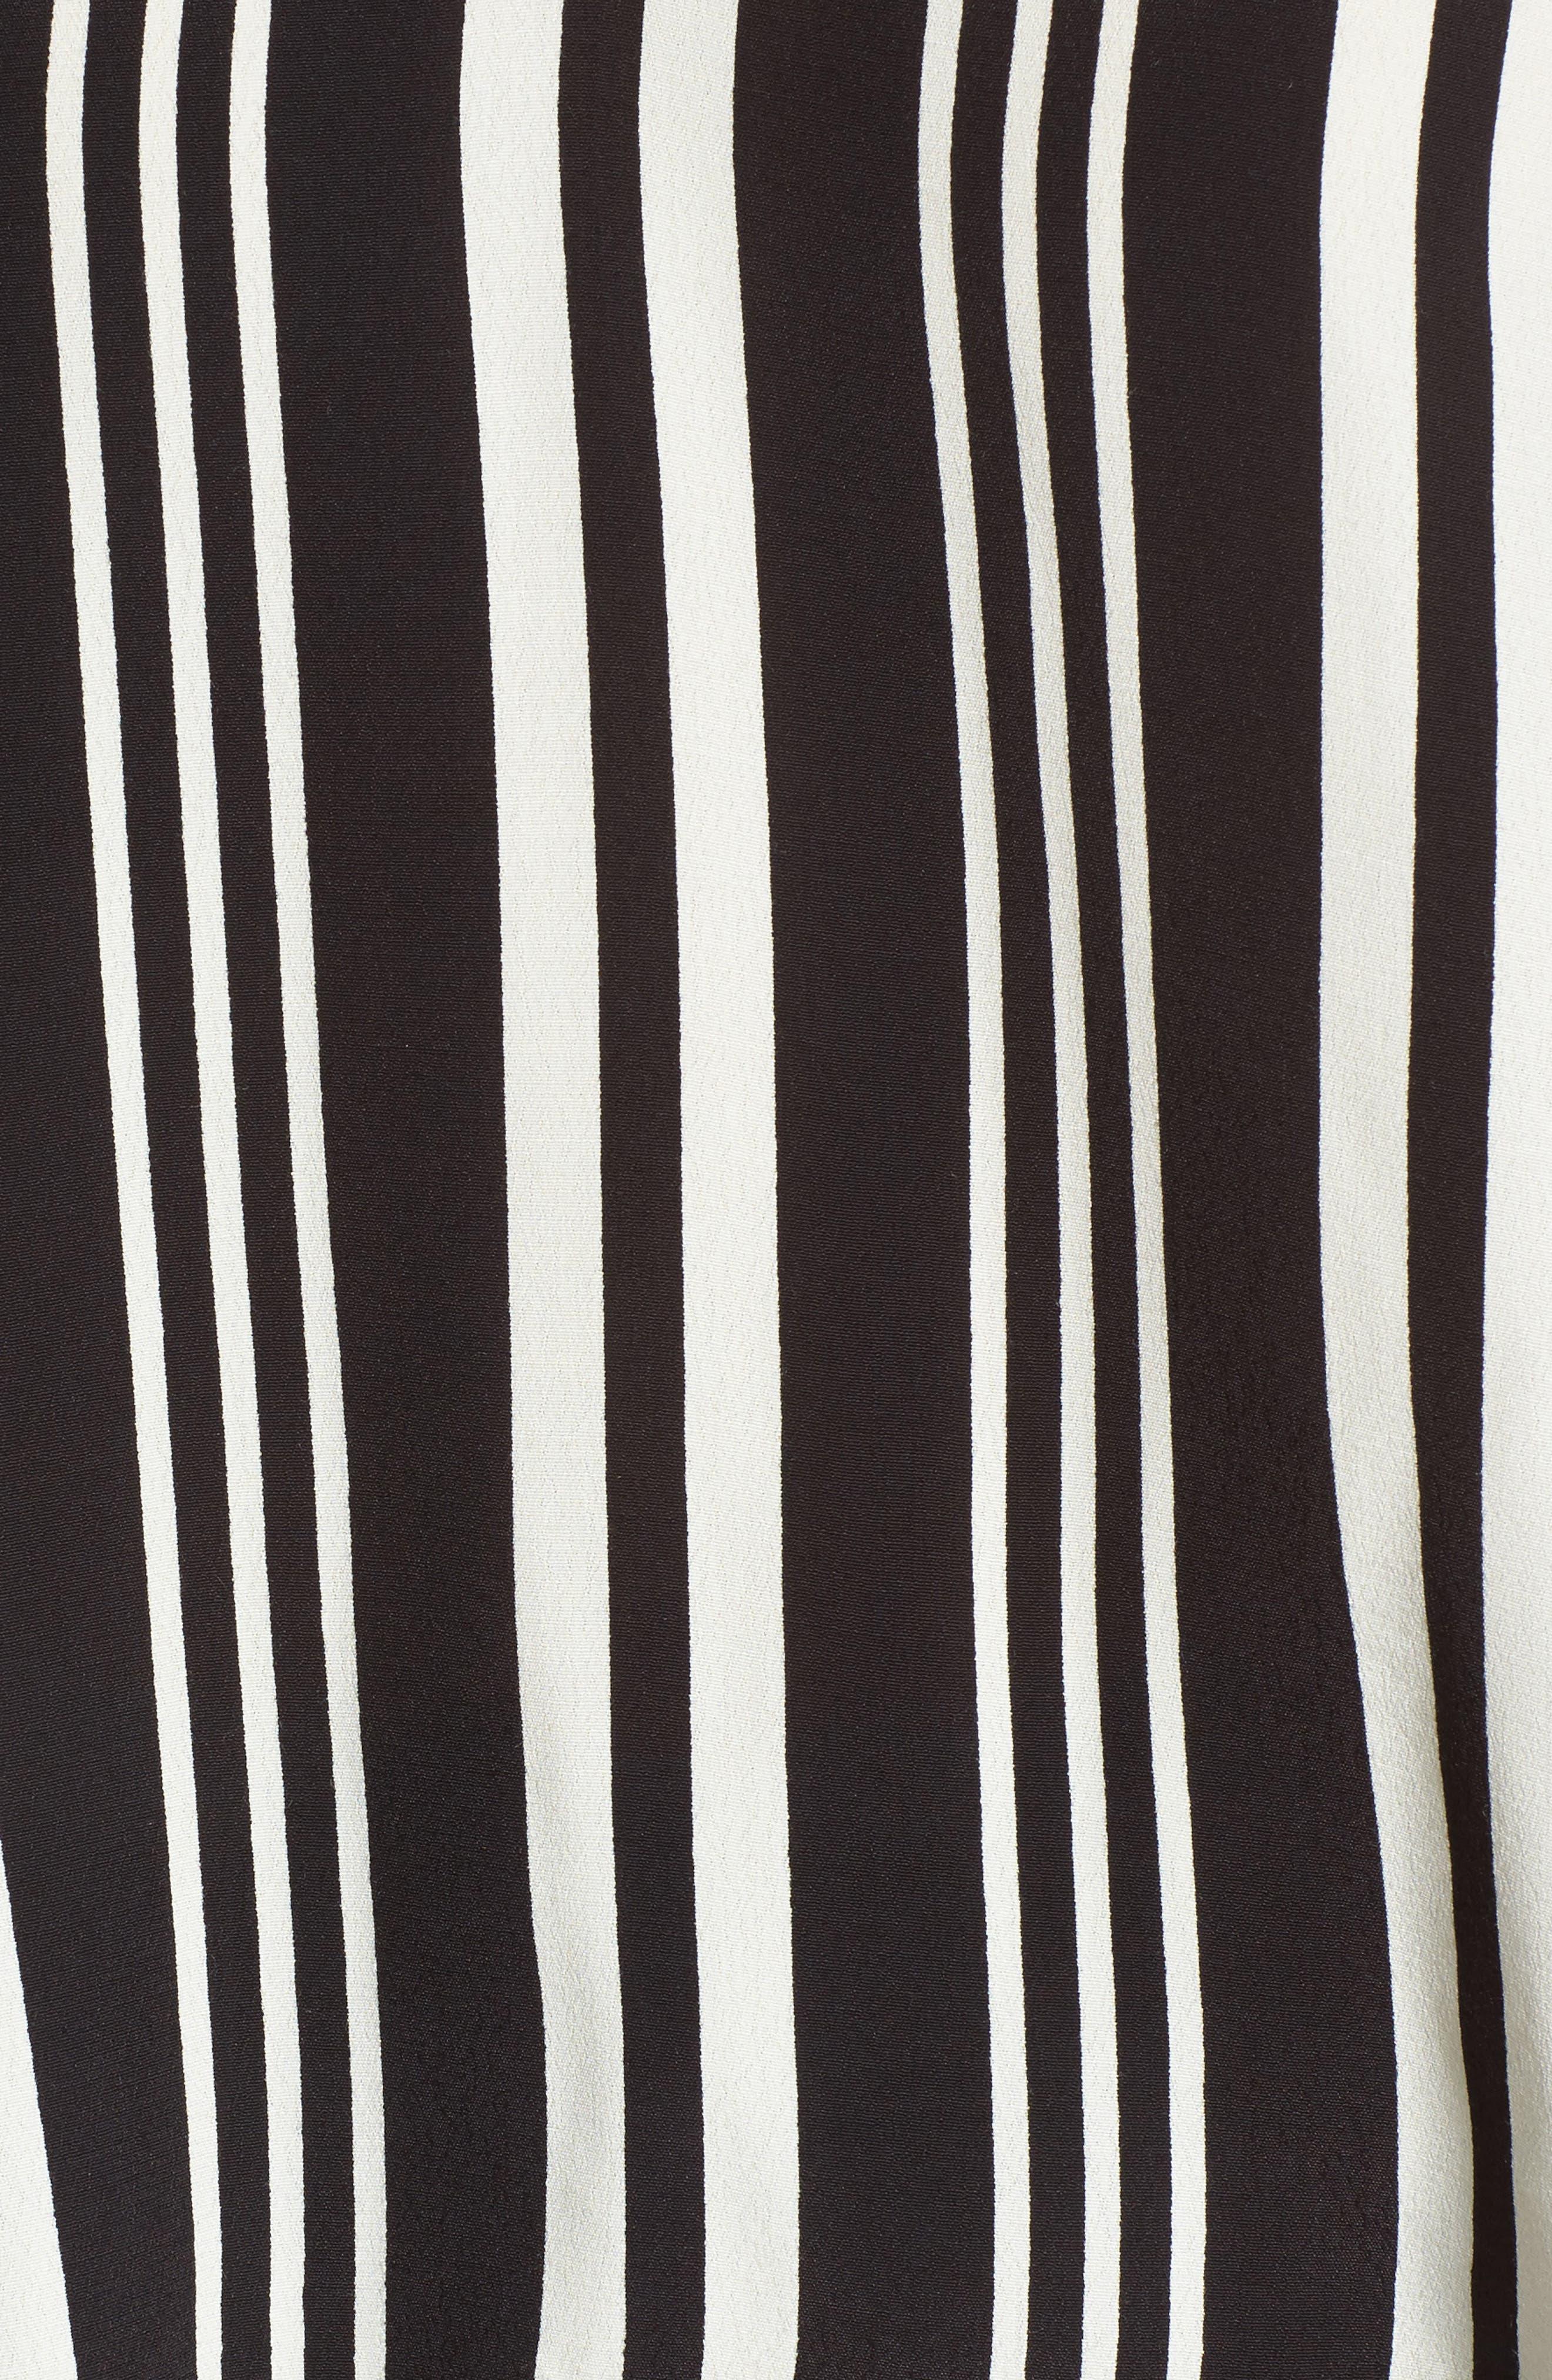 Double V Swing Tank,                             Alternate thumbnail 5, color,                             Black Bold Wide Stripe